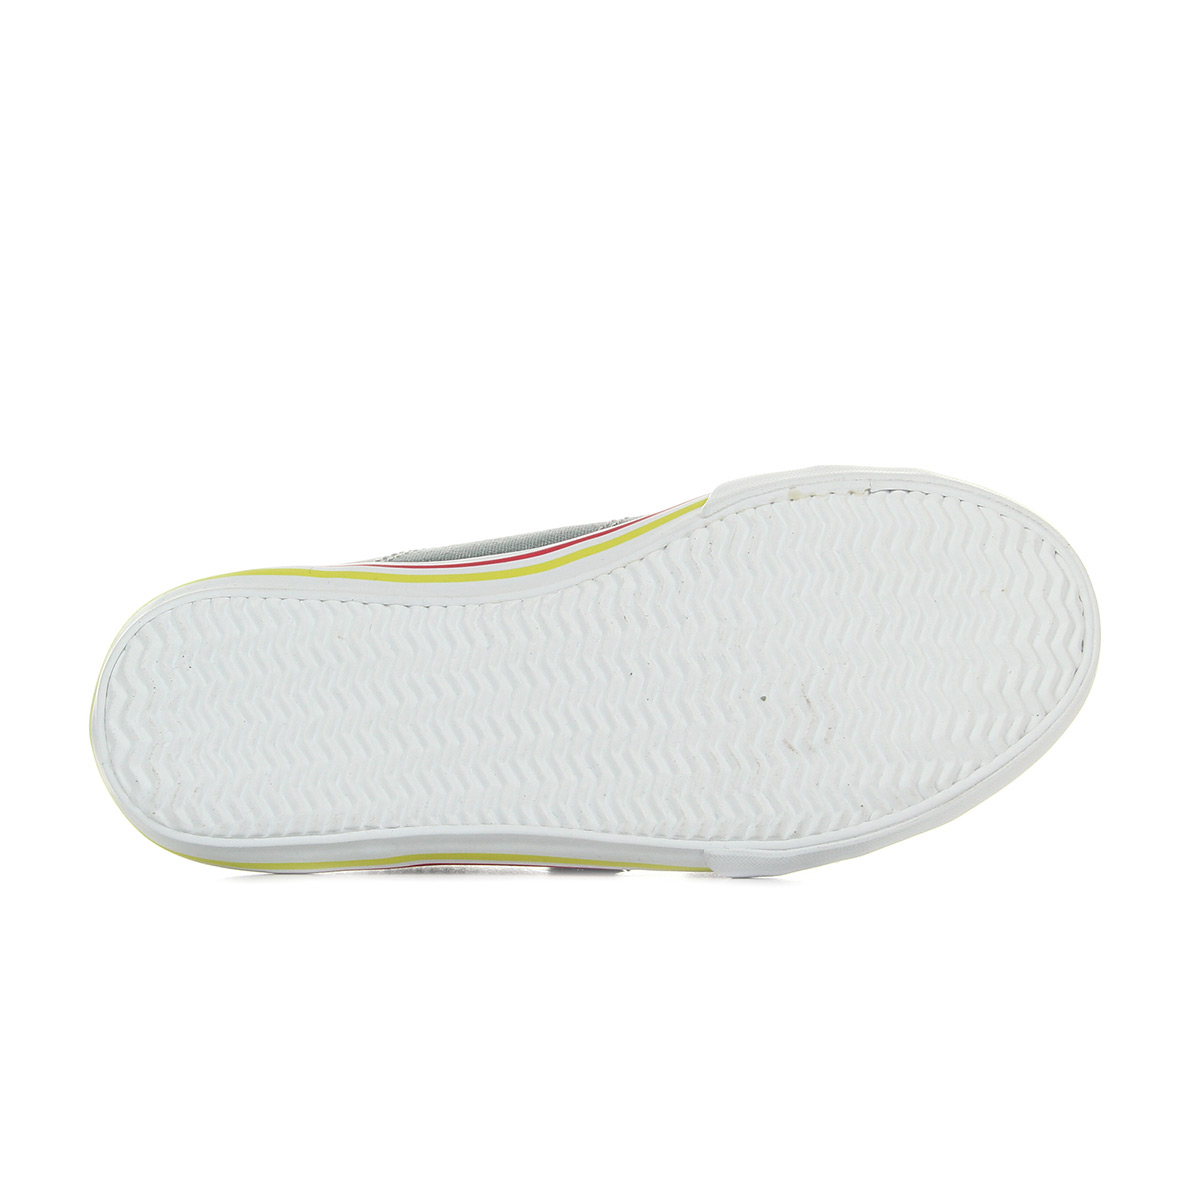 58ef705d935b Chaussures Baskets Le Coq Sportif garçon Saint Gaetan PS CVS taille ...